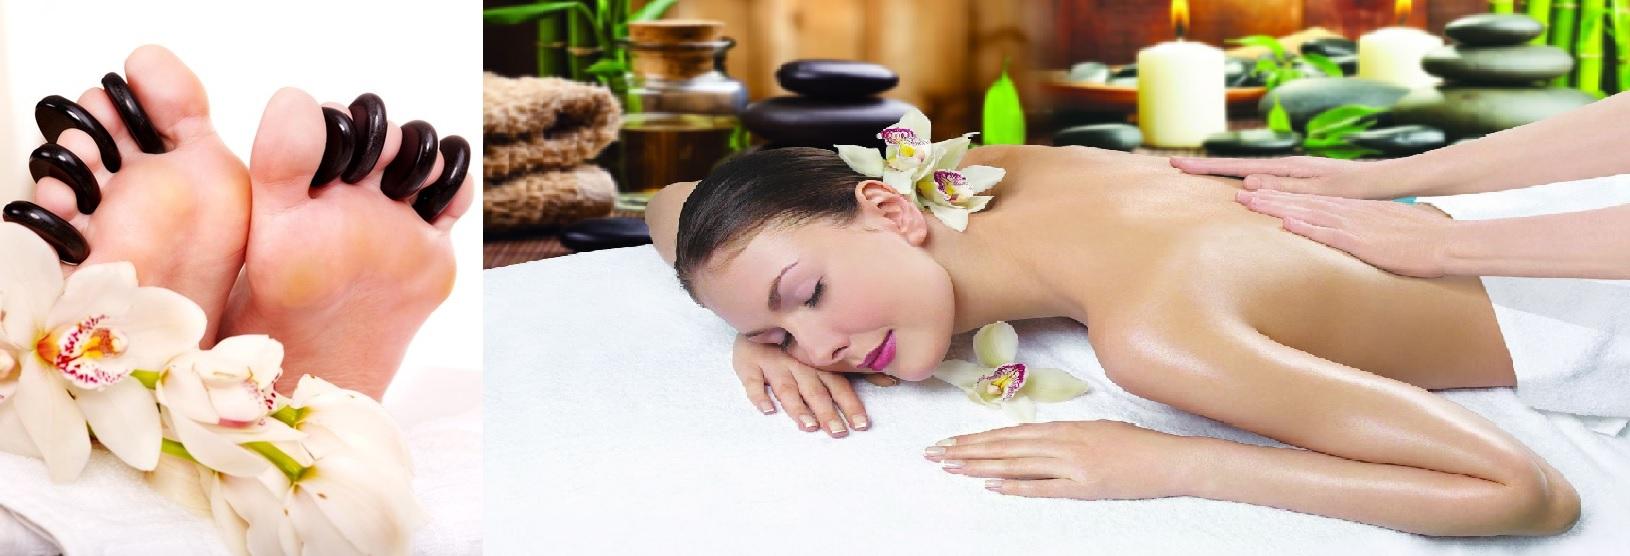 massage-vat-ly-tri-lieu-dac-tri-nhuc-moi-vai-gay